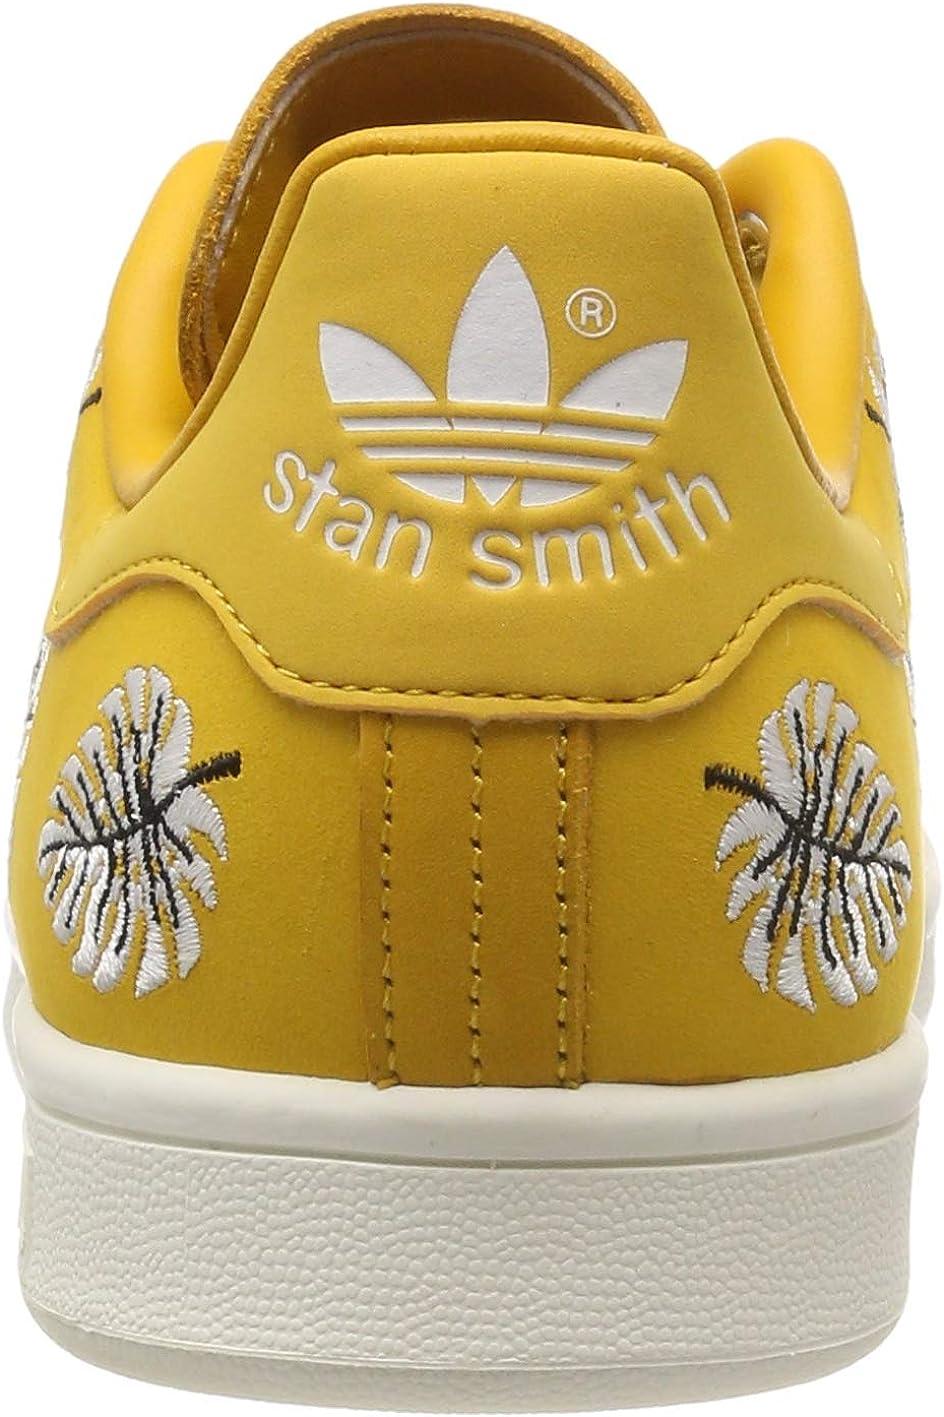 adidas Stan Smith W, Basket Femme Or Oroart Oroart Casbla 0